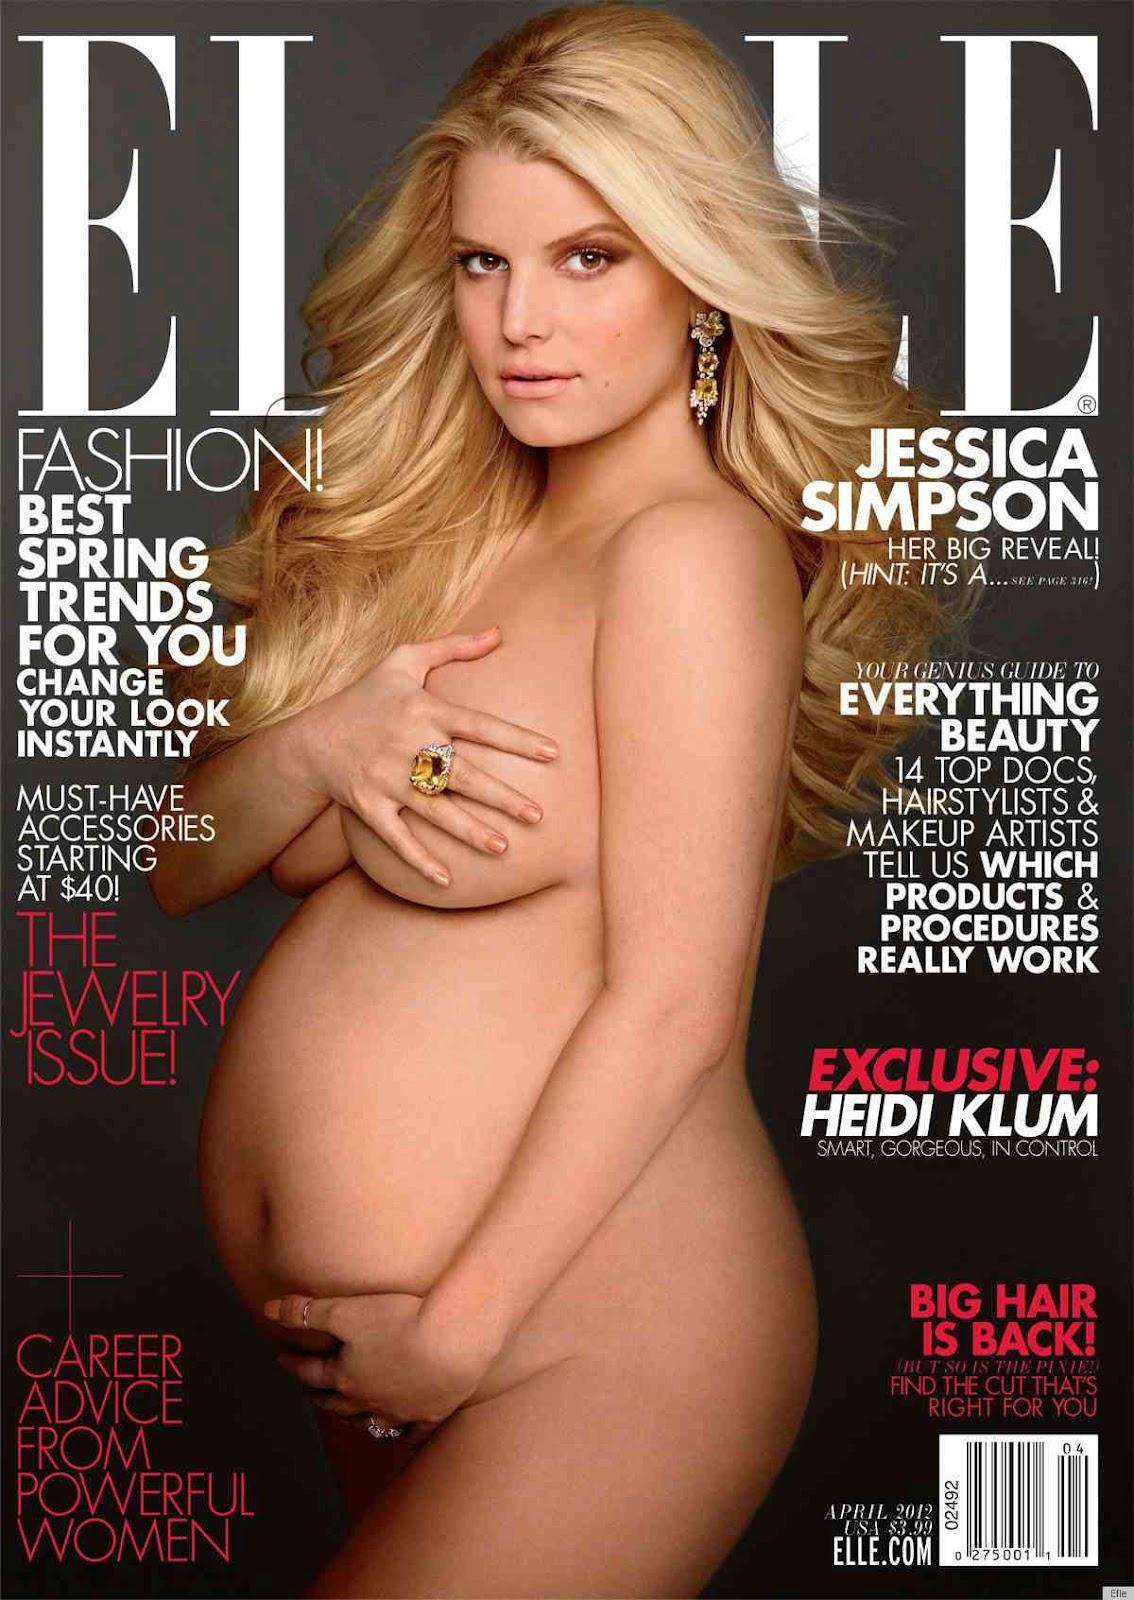 http://2.bp.blogspot.com/-E9xUHXmnyPg/T1gtsgZt7LI/AAAAAAAAAnk/WqrXQ_Ut4Qw/s1600/JESSICA-SIMPSON-ELLE-PREGNANT.jpg